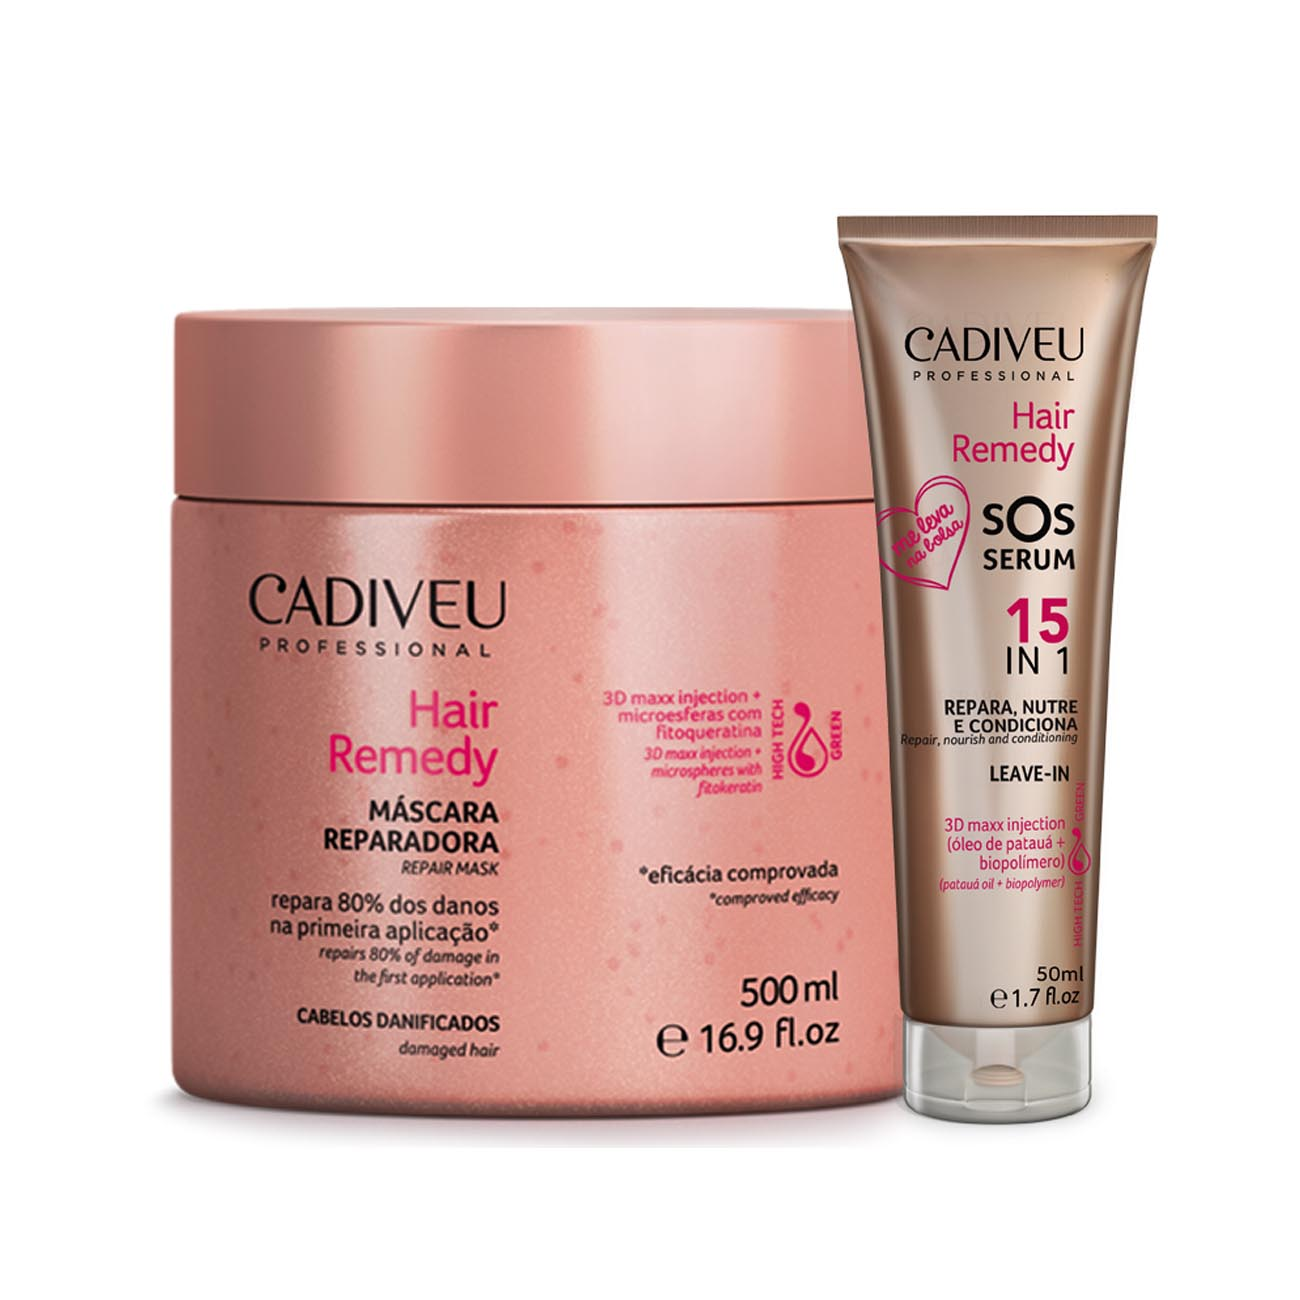 Cadiveu Hair Remedy Máscara Reparadora + Sos Serum Leave-in